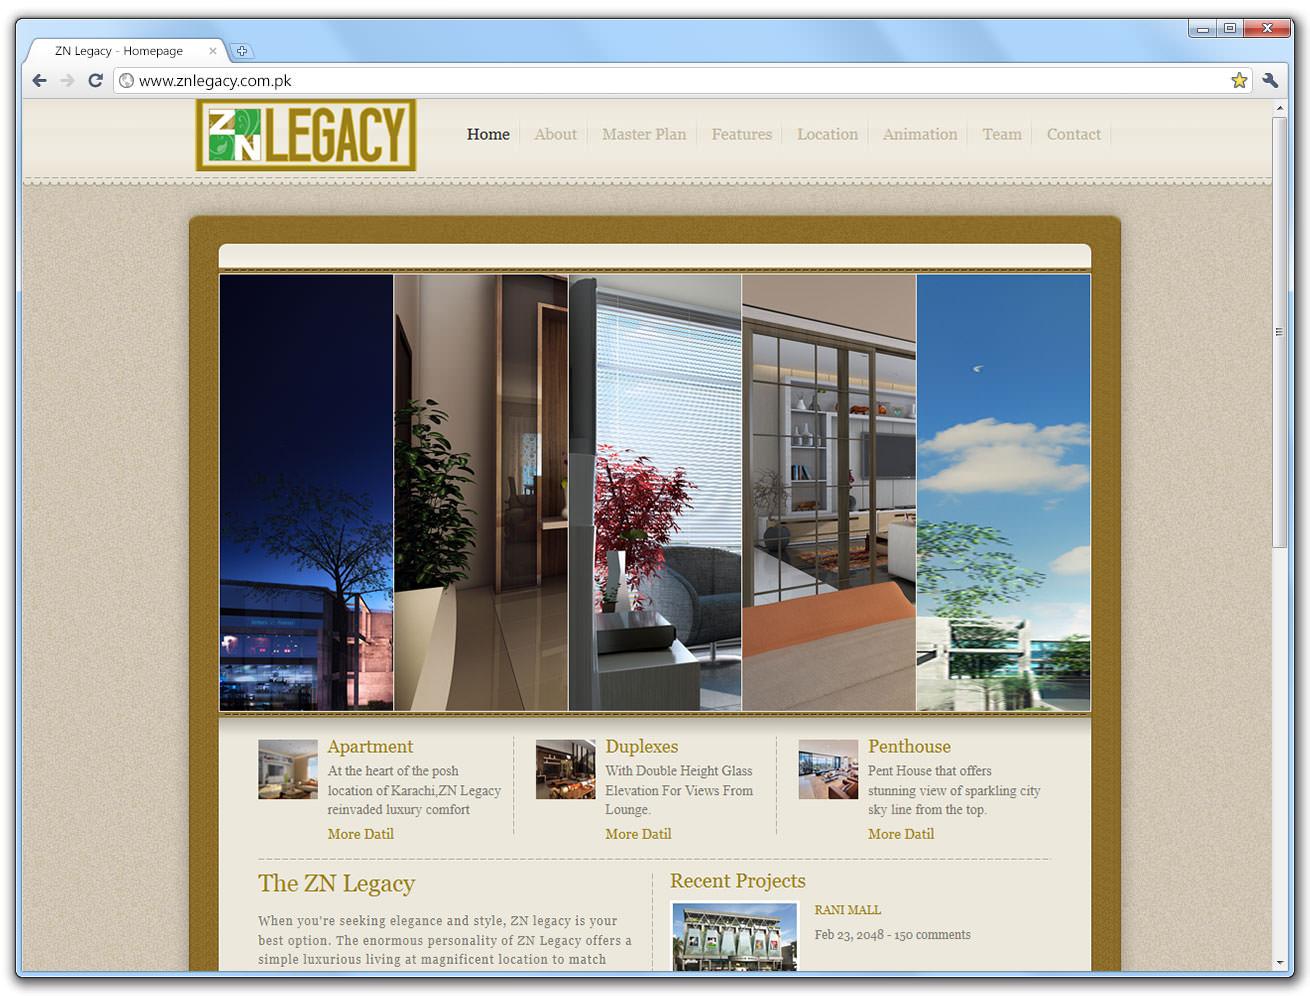 zn-legacy-website